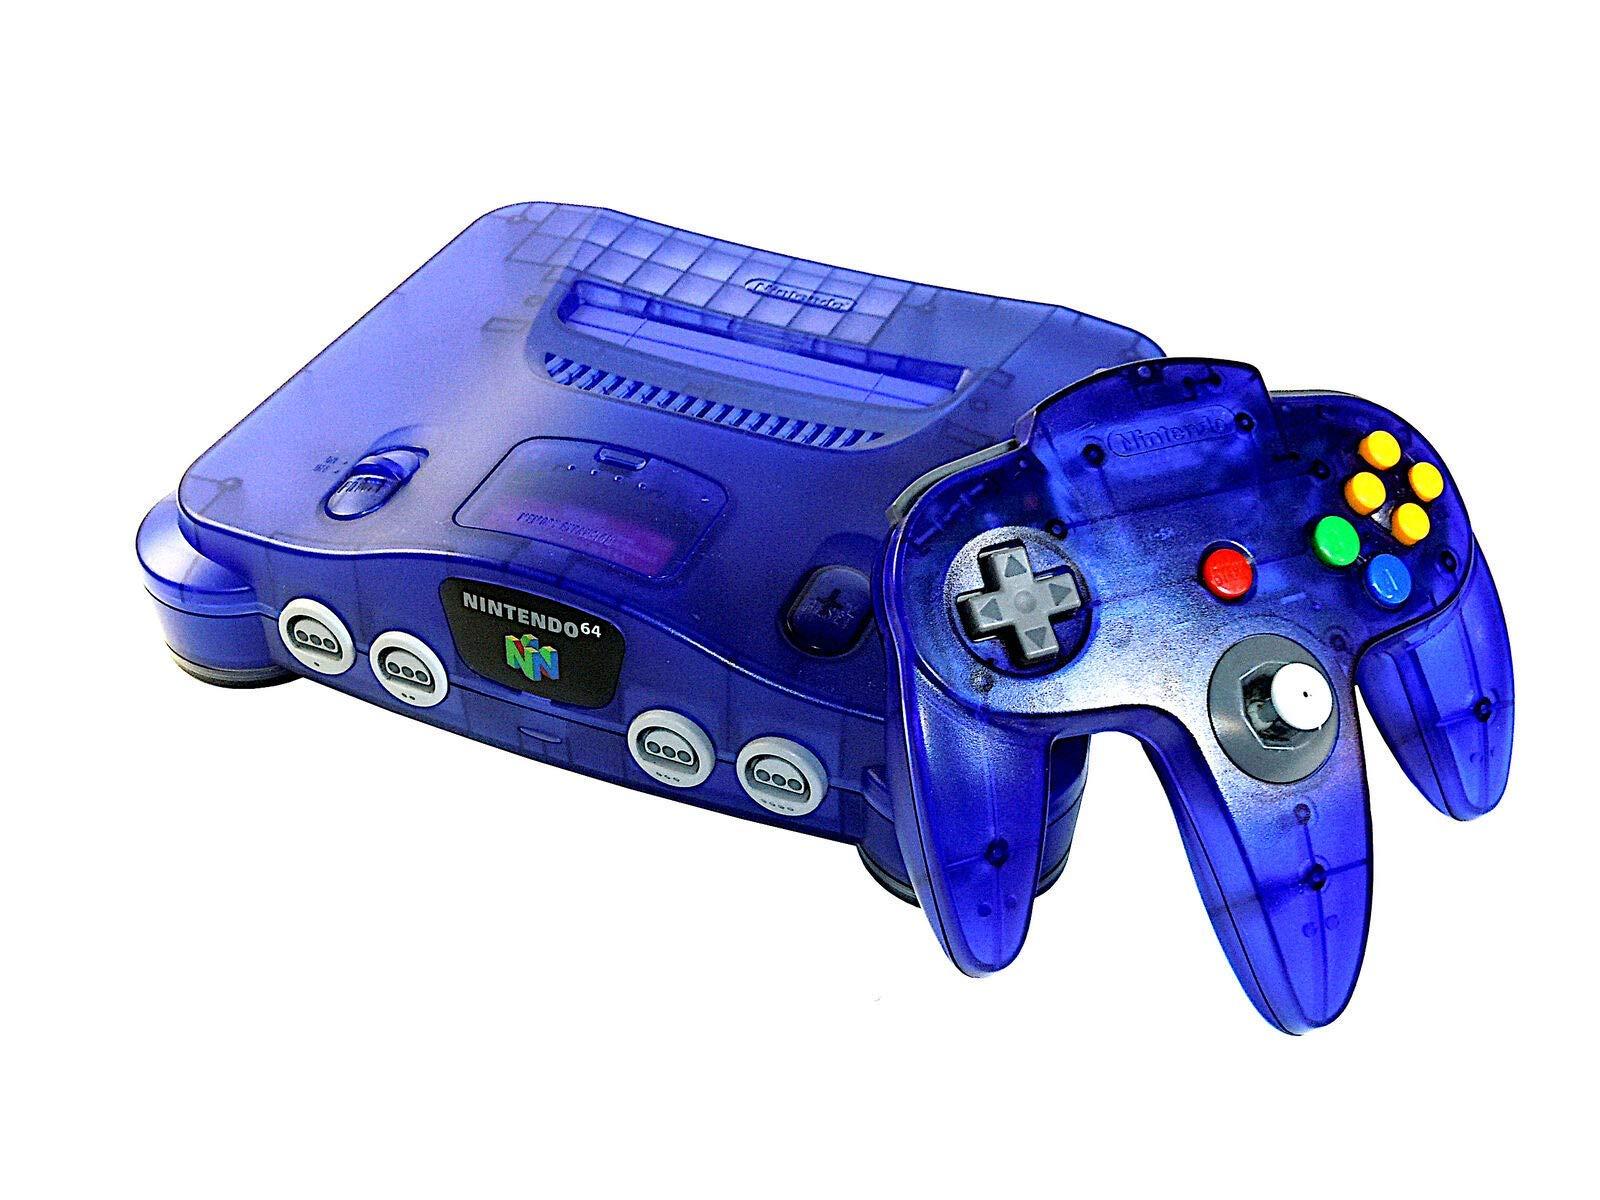 Nintendo 64 Console - Grape (Renewed)